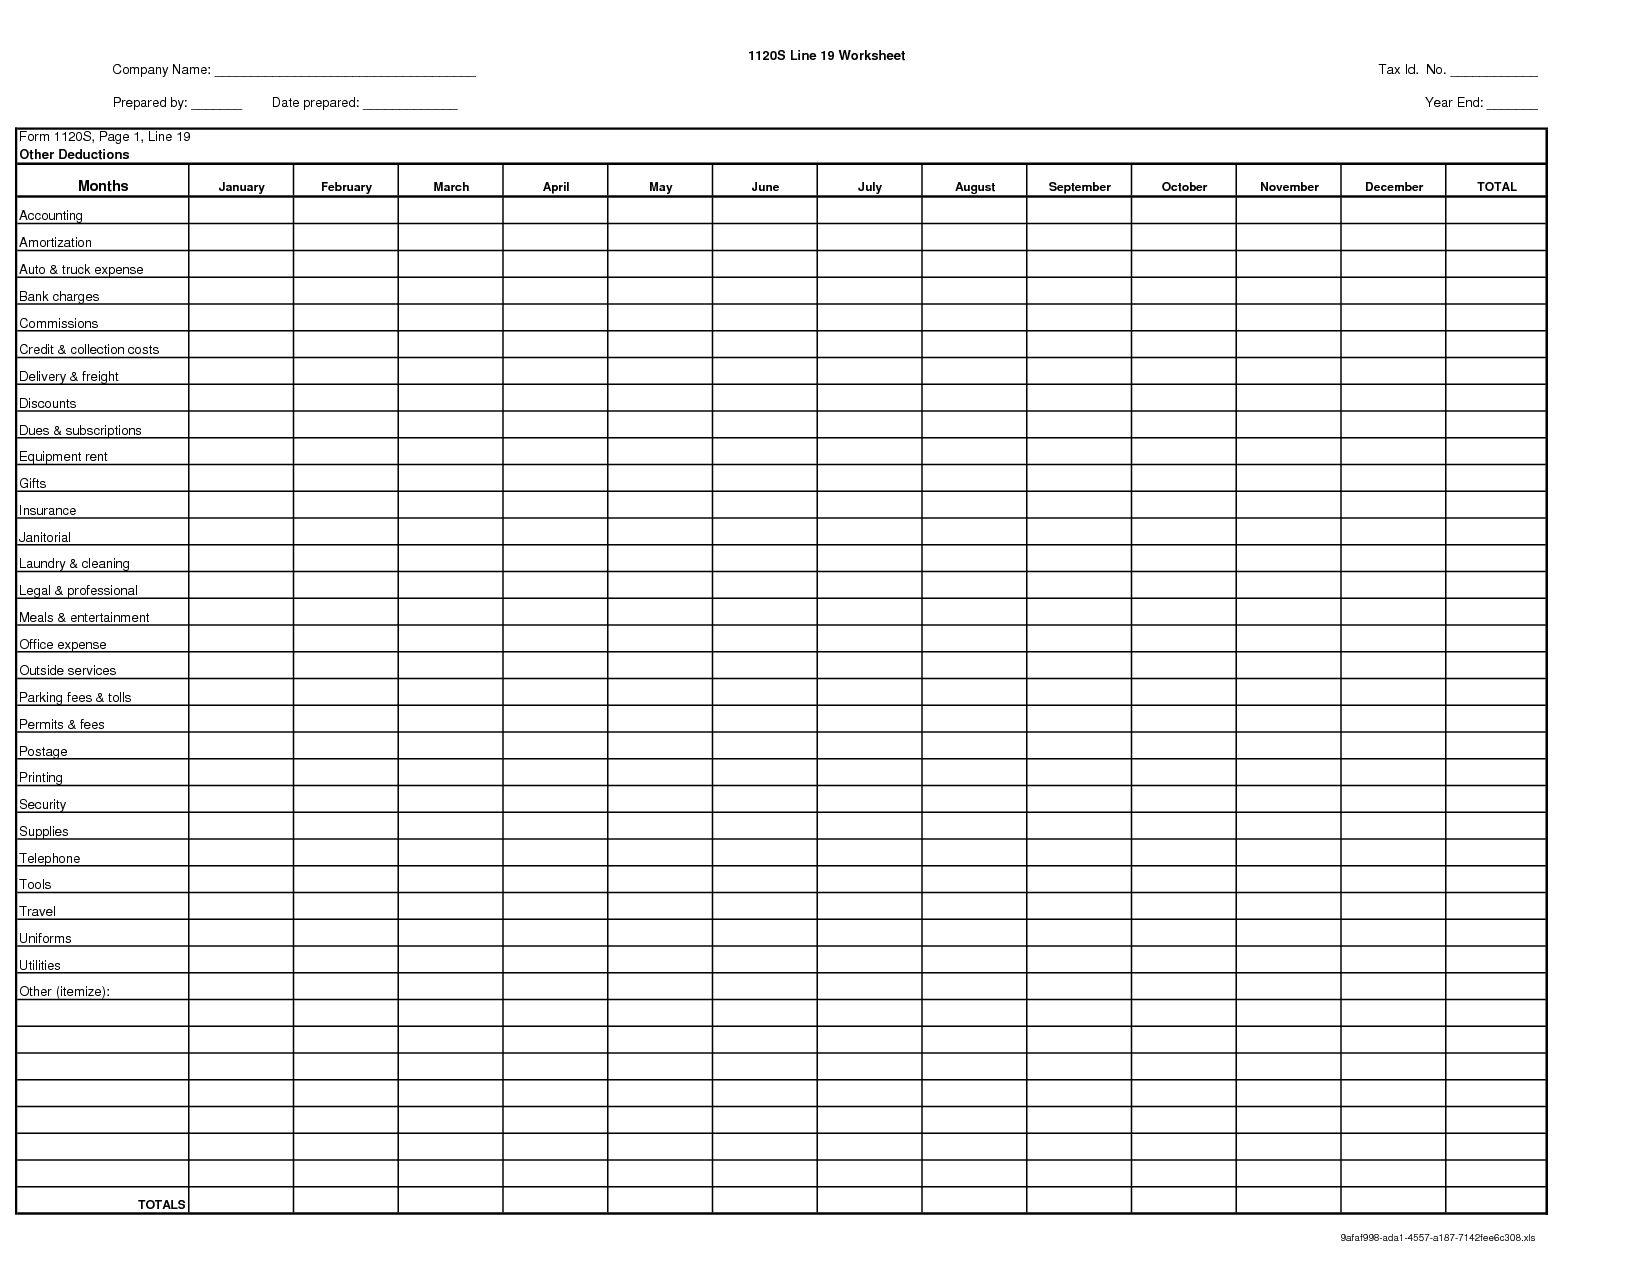 Tax Itemized Deduction Worksheet